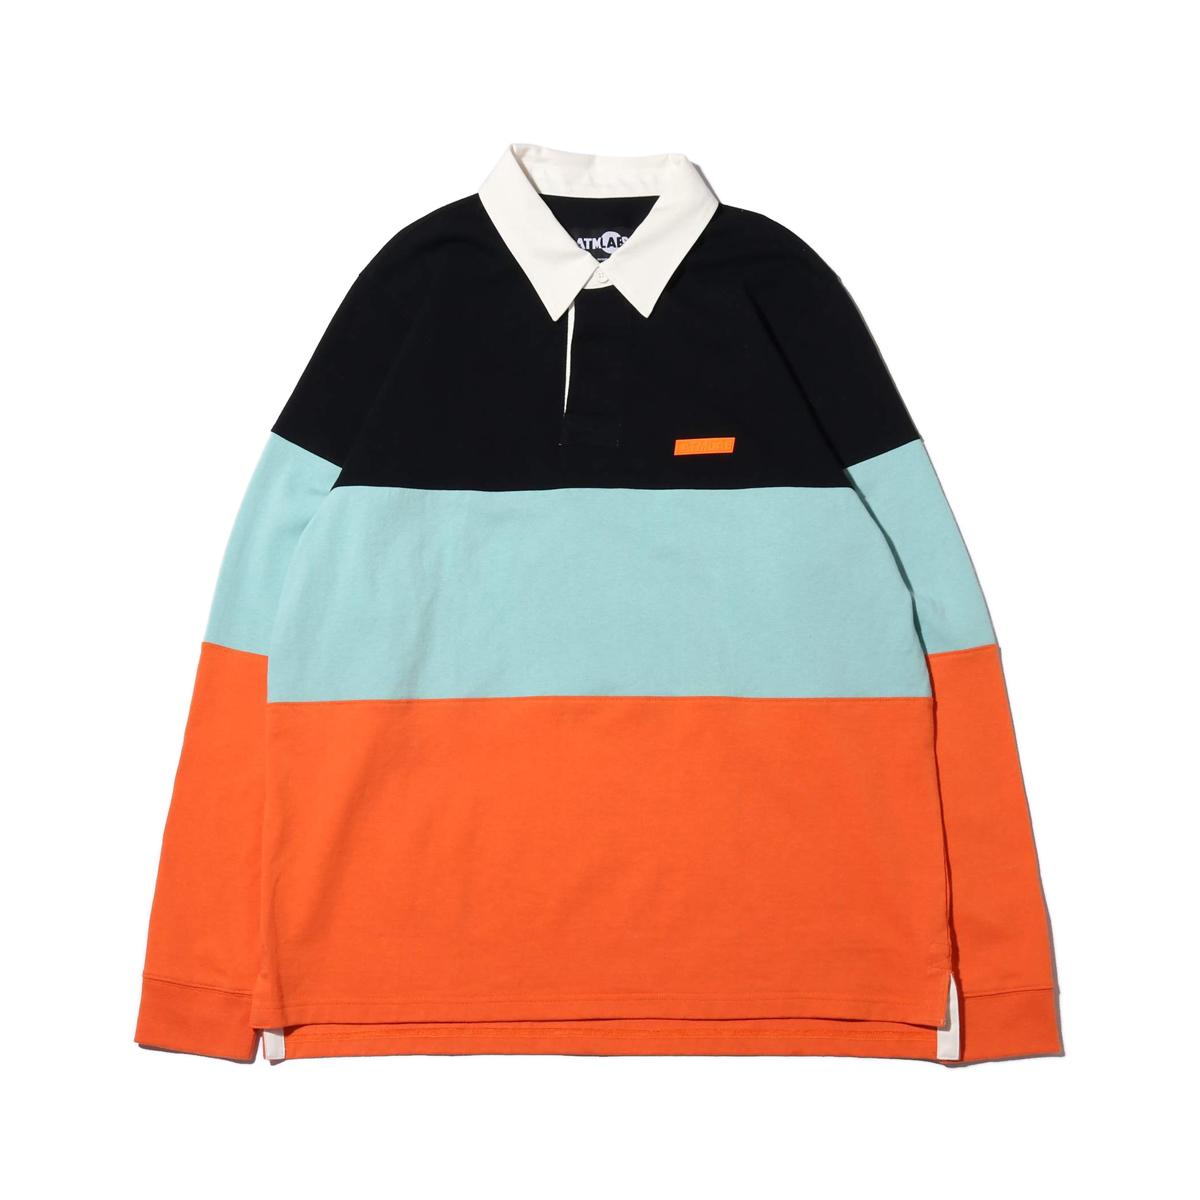 ATMOS LAB RUGBY SHIRT (アトモスラボ ラグビー シャツ)ORANGE【メンズ 長袖Tシャツ】19SP-I